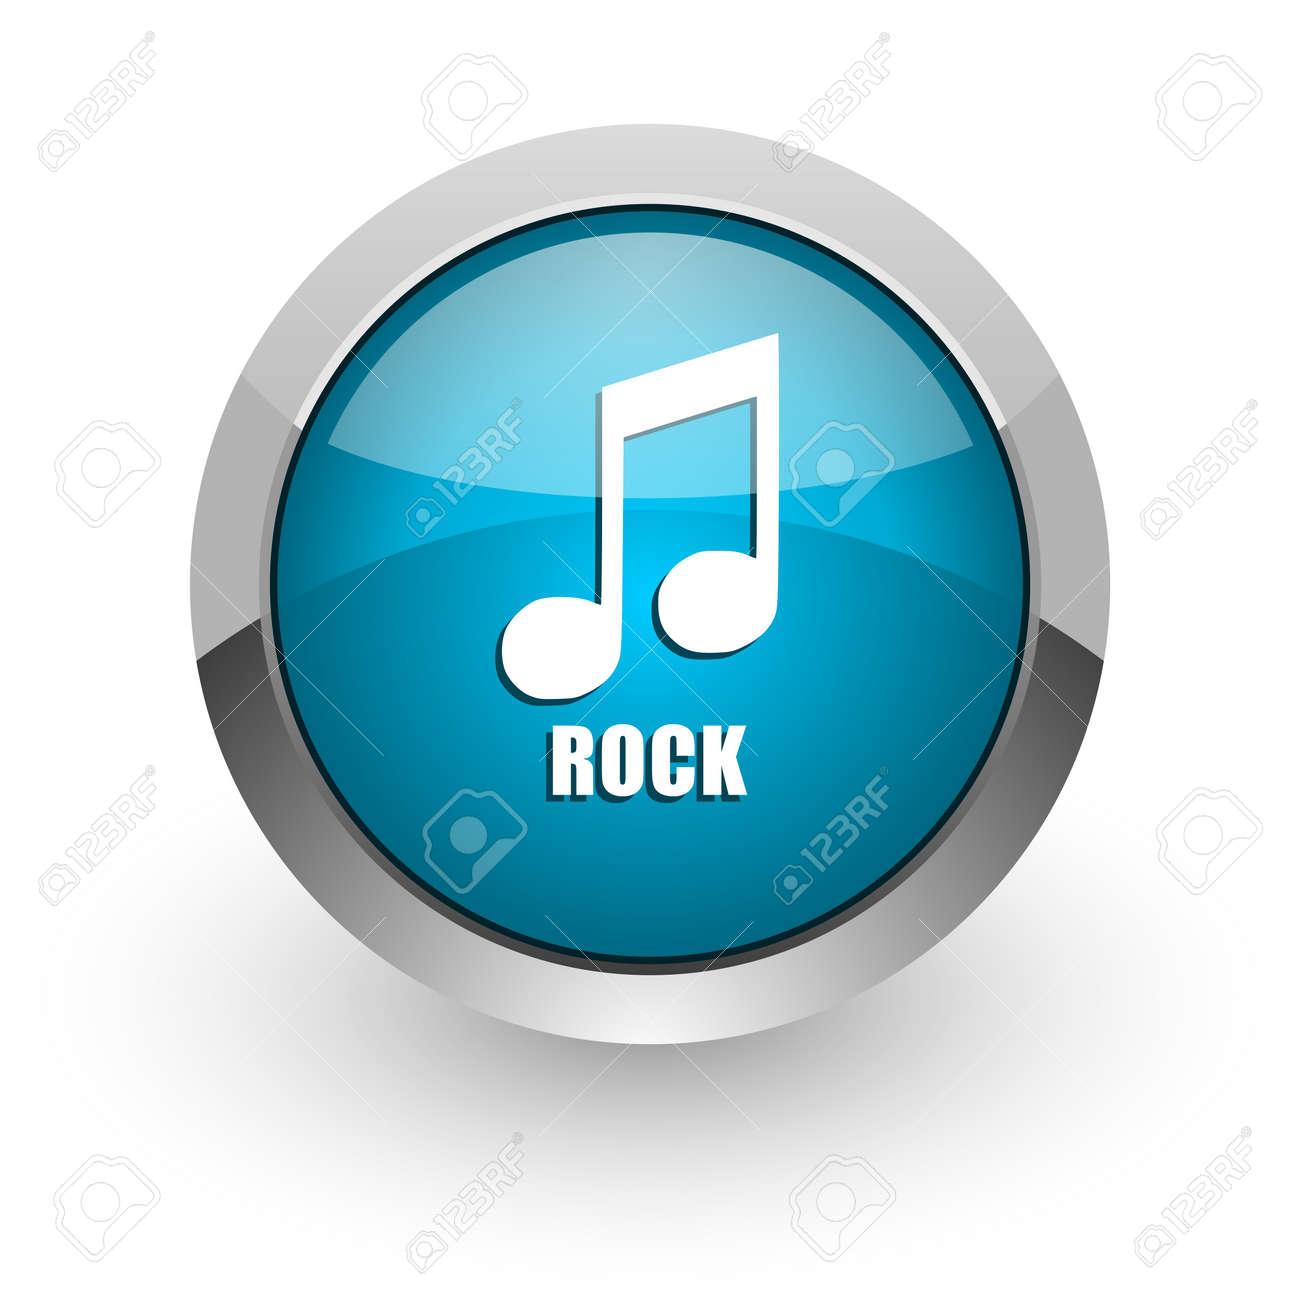 Rock music blue silver metallic chrome border web and mobile